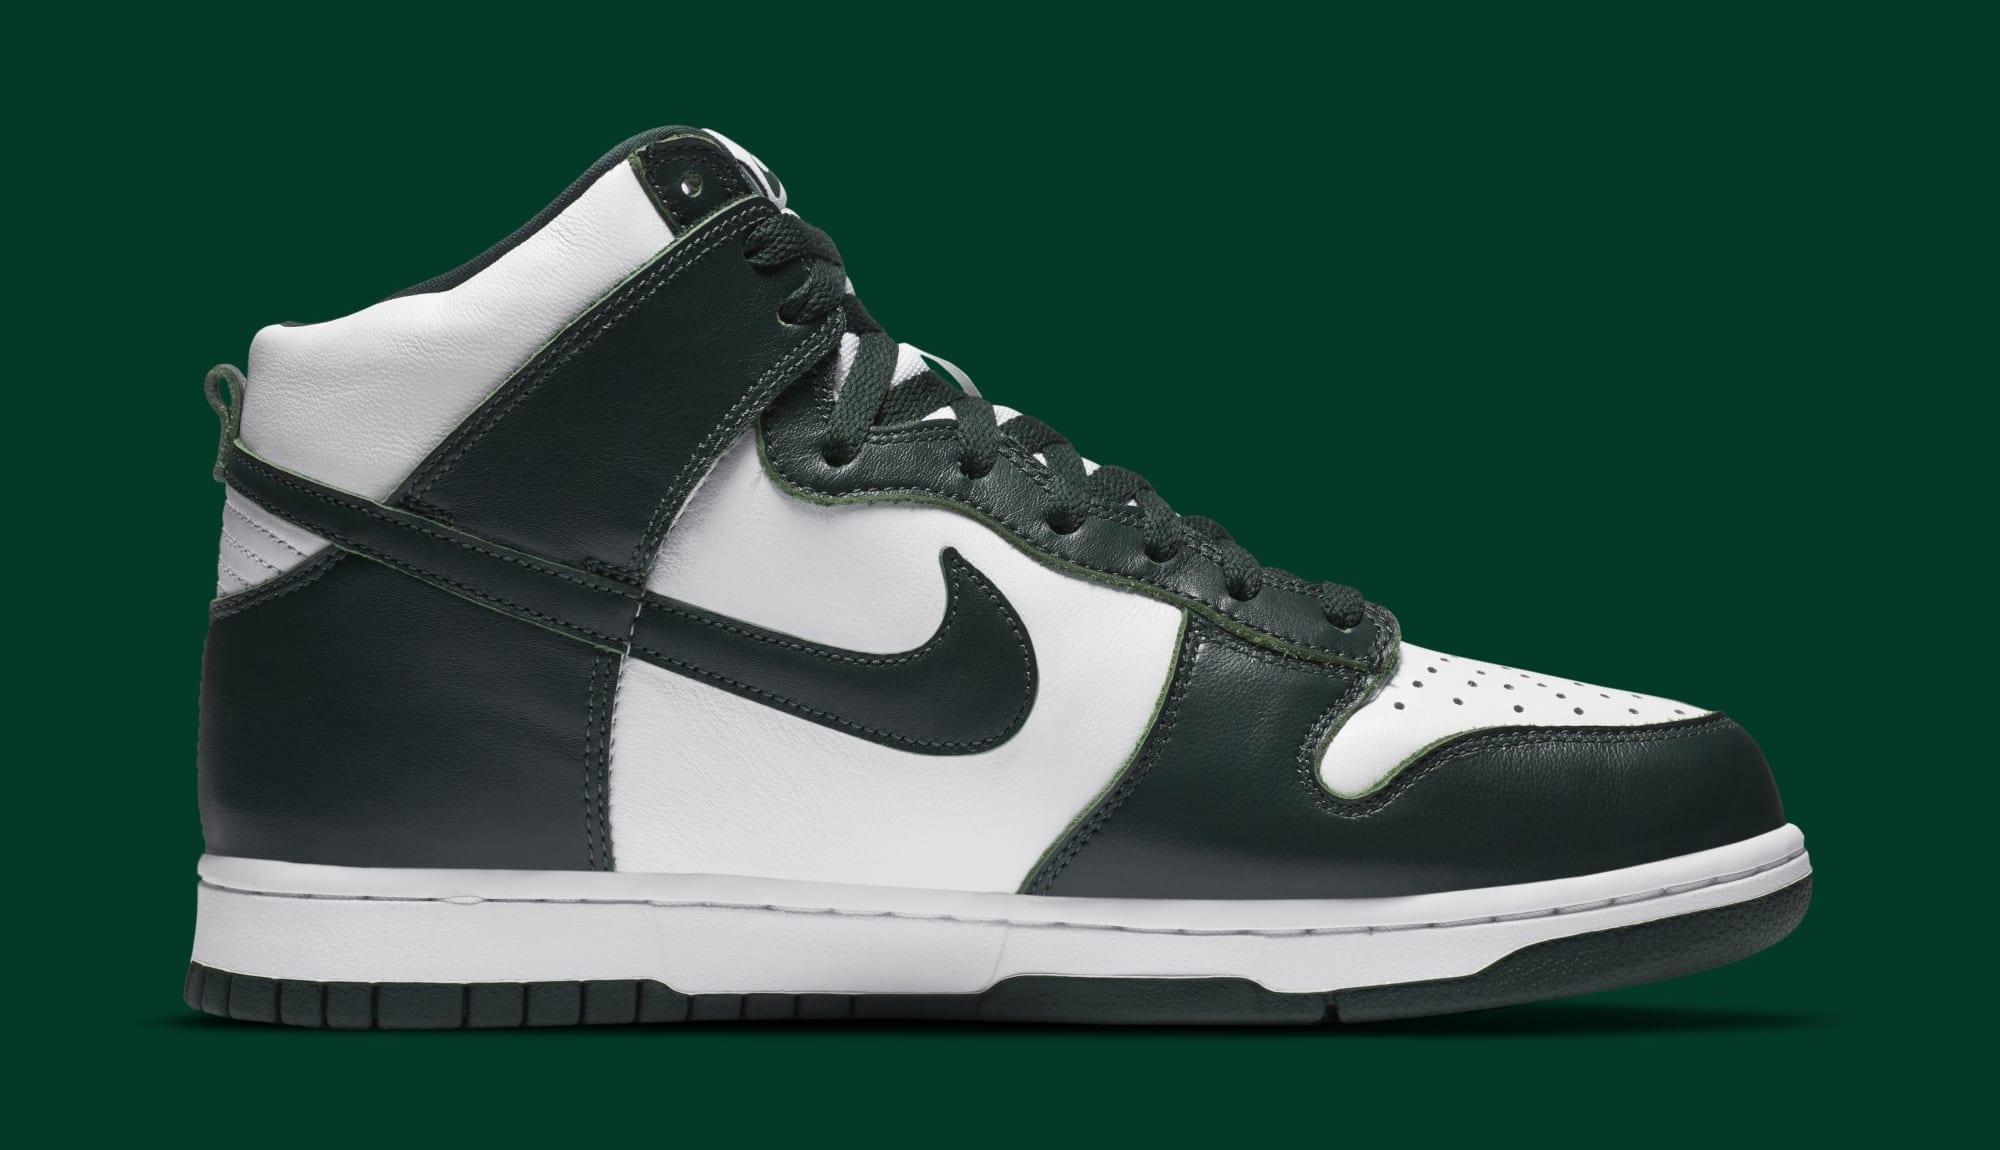 Nike Dunk High SP 'Pro Green' CZ8149-100 Medial